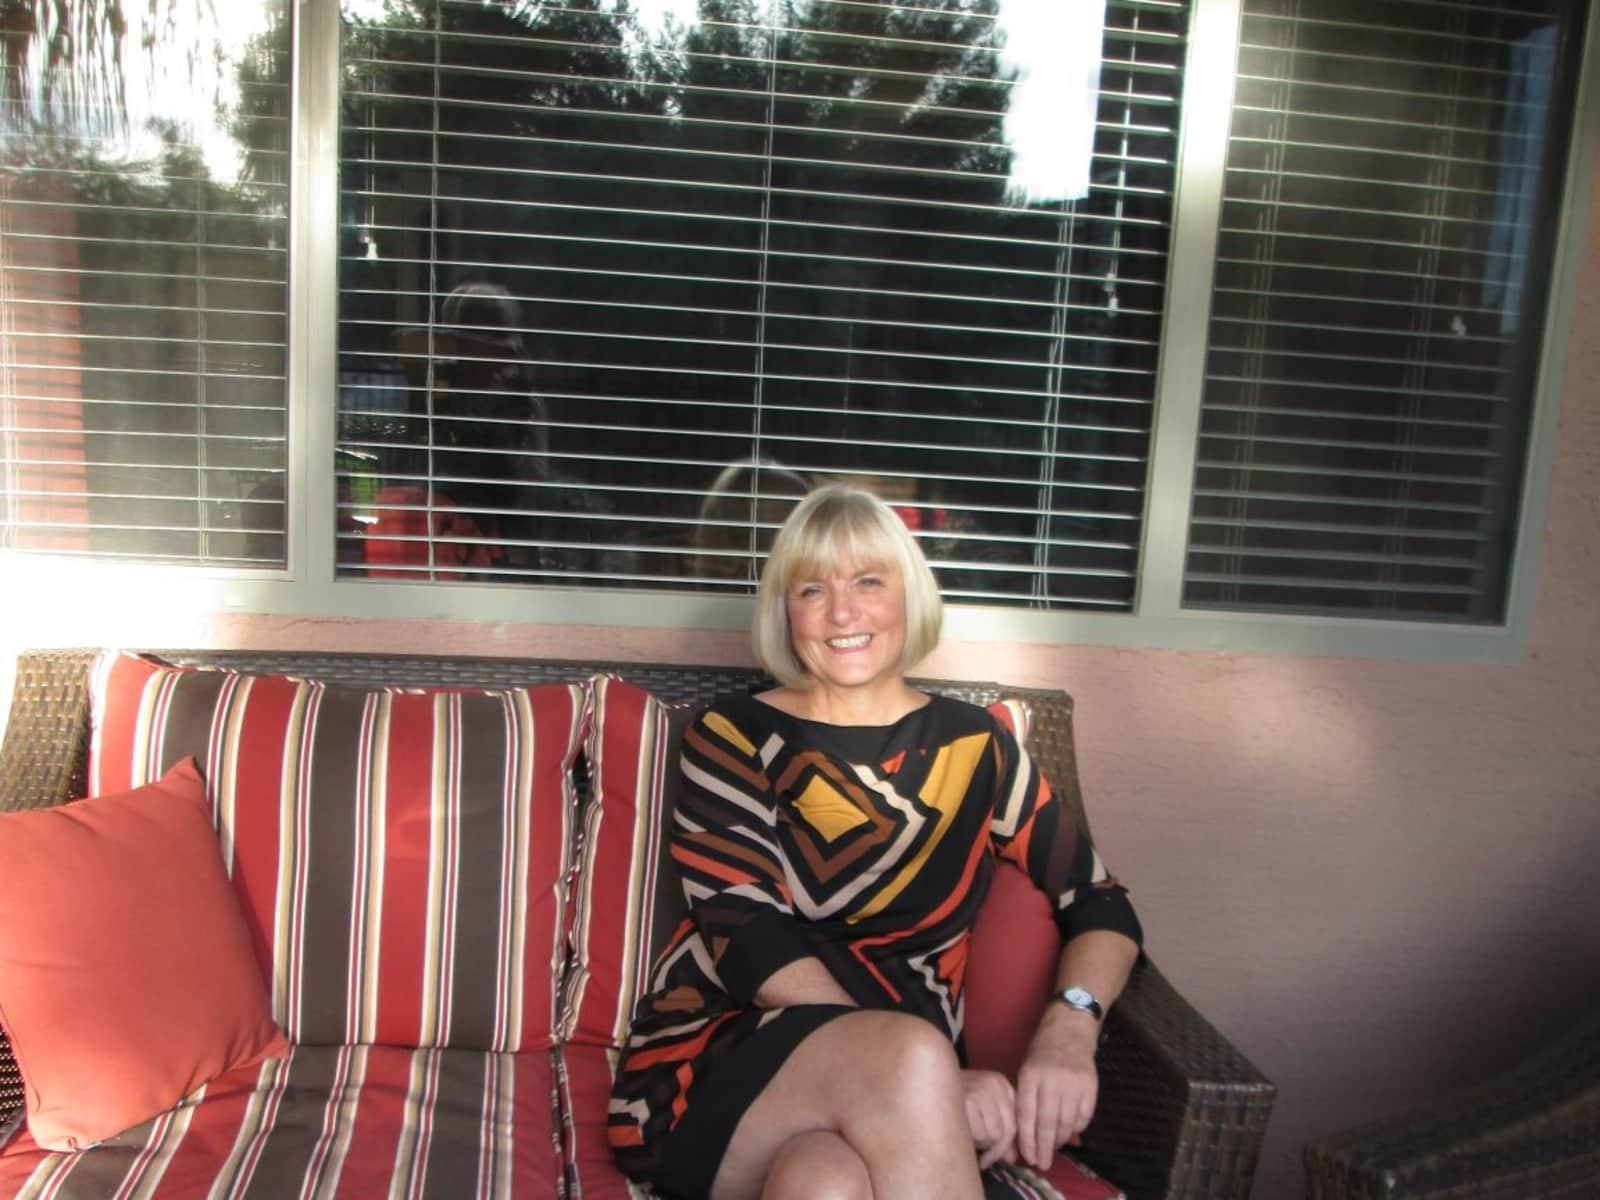 Nancy from Surrey, British Columbia, Canada